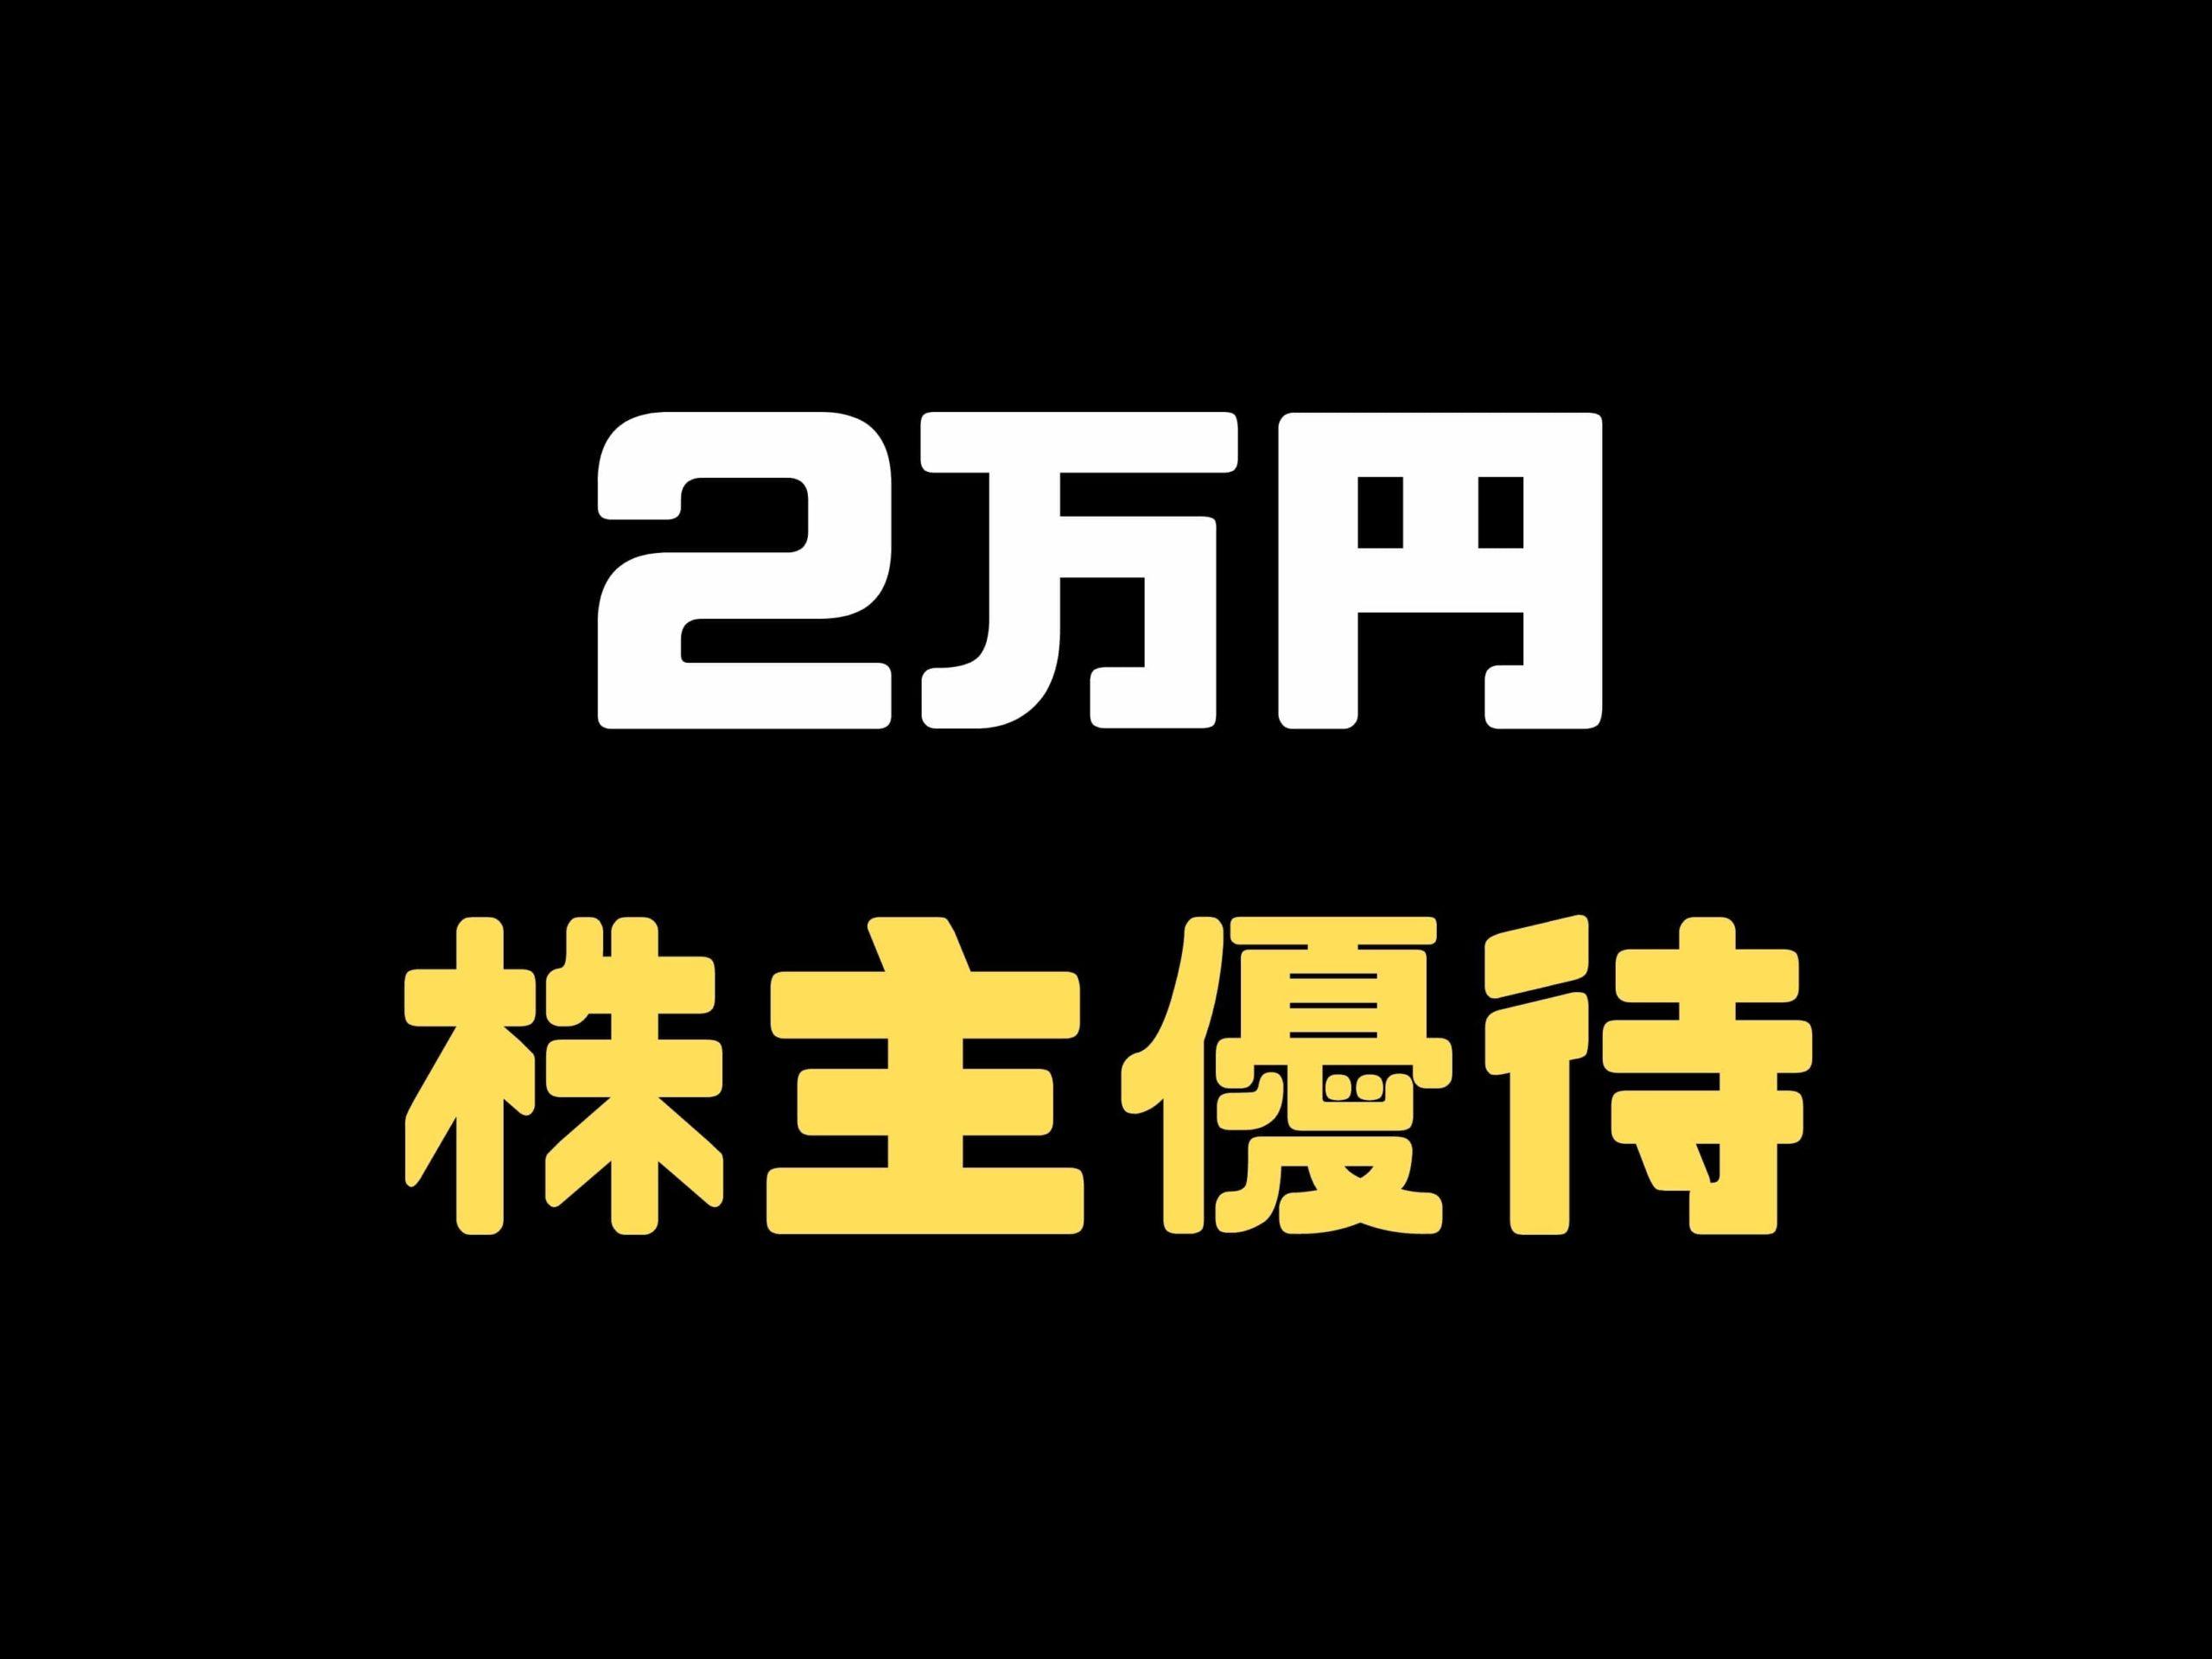 【2021年版】2万円以下で購入出来る株主優待